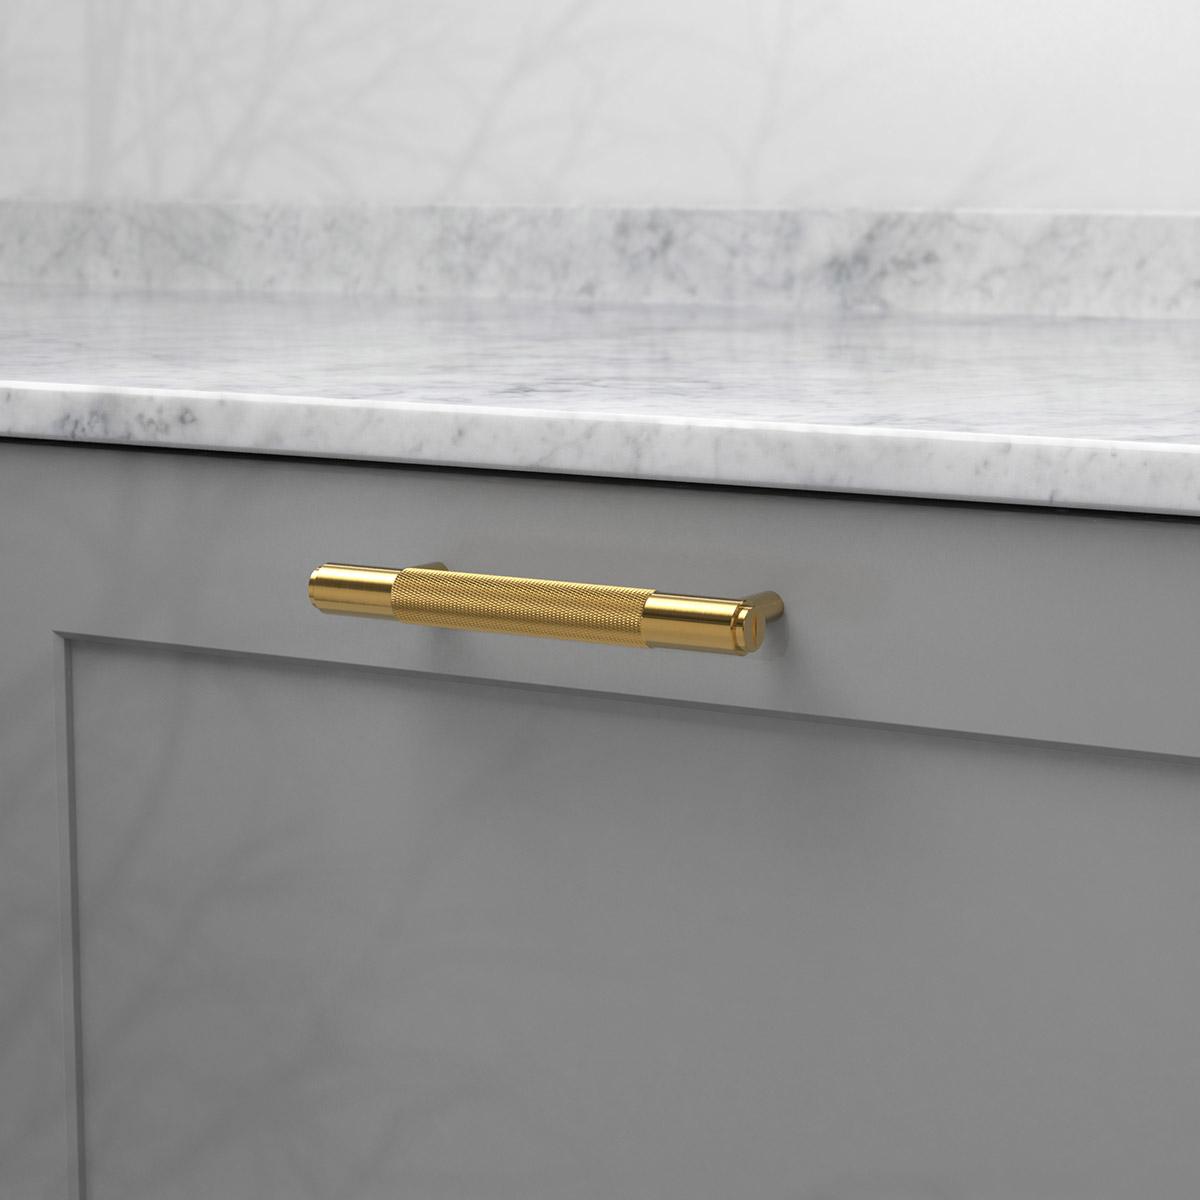 pull bar massing uk pb h 160 br a cc 125 mm ncs s 4500 n marmor carrara 2